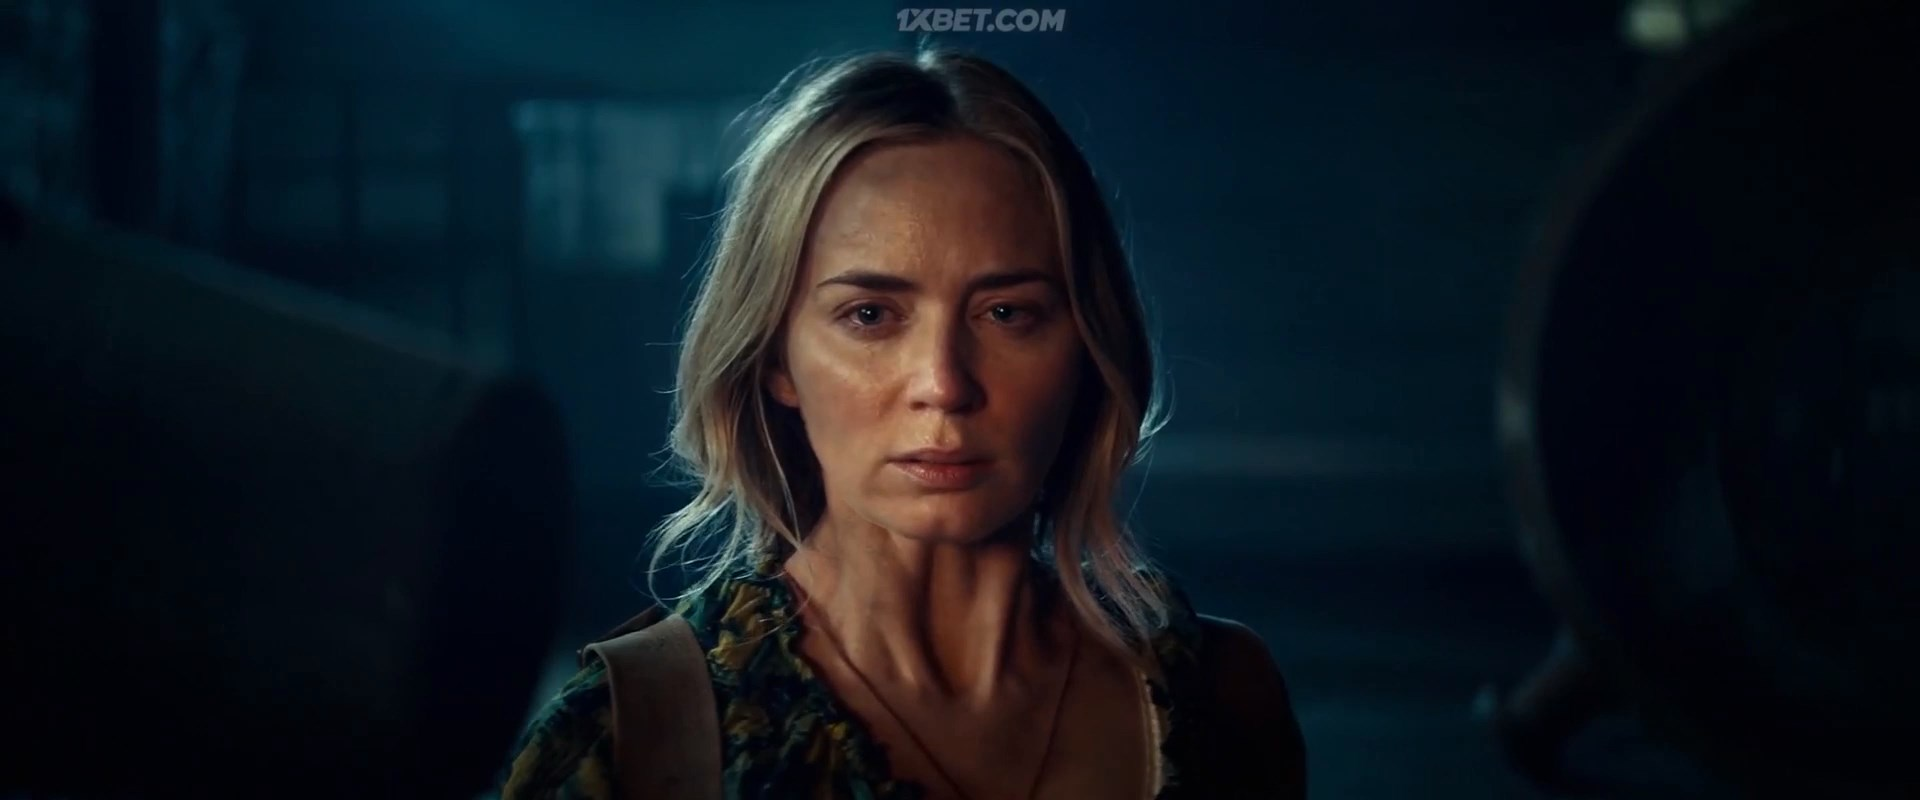 Un lugar en silencio: Parte II (2021) 1080p HDRip Latino